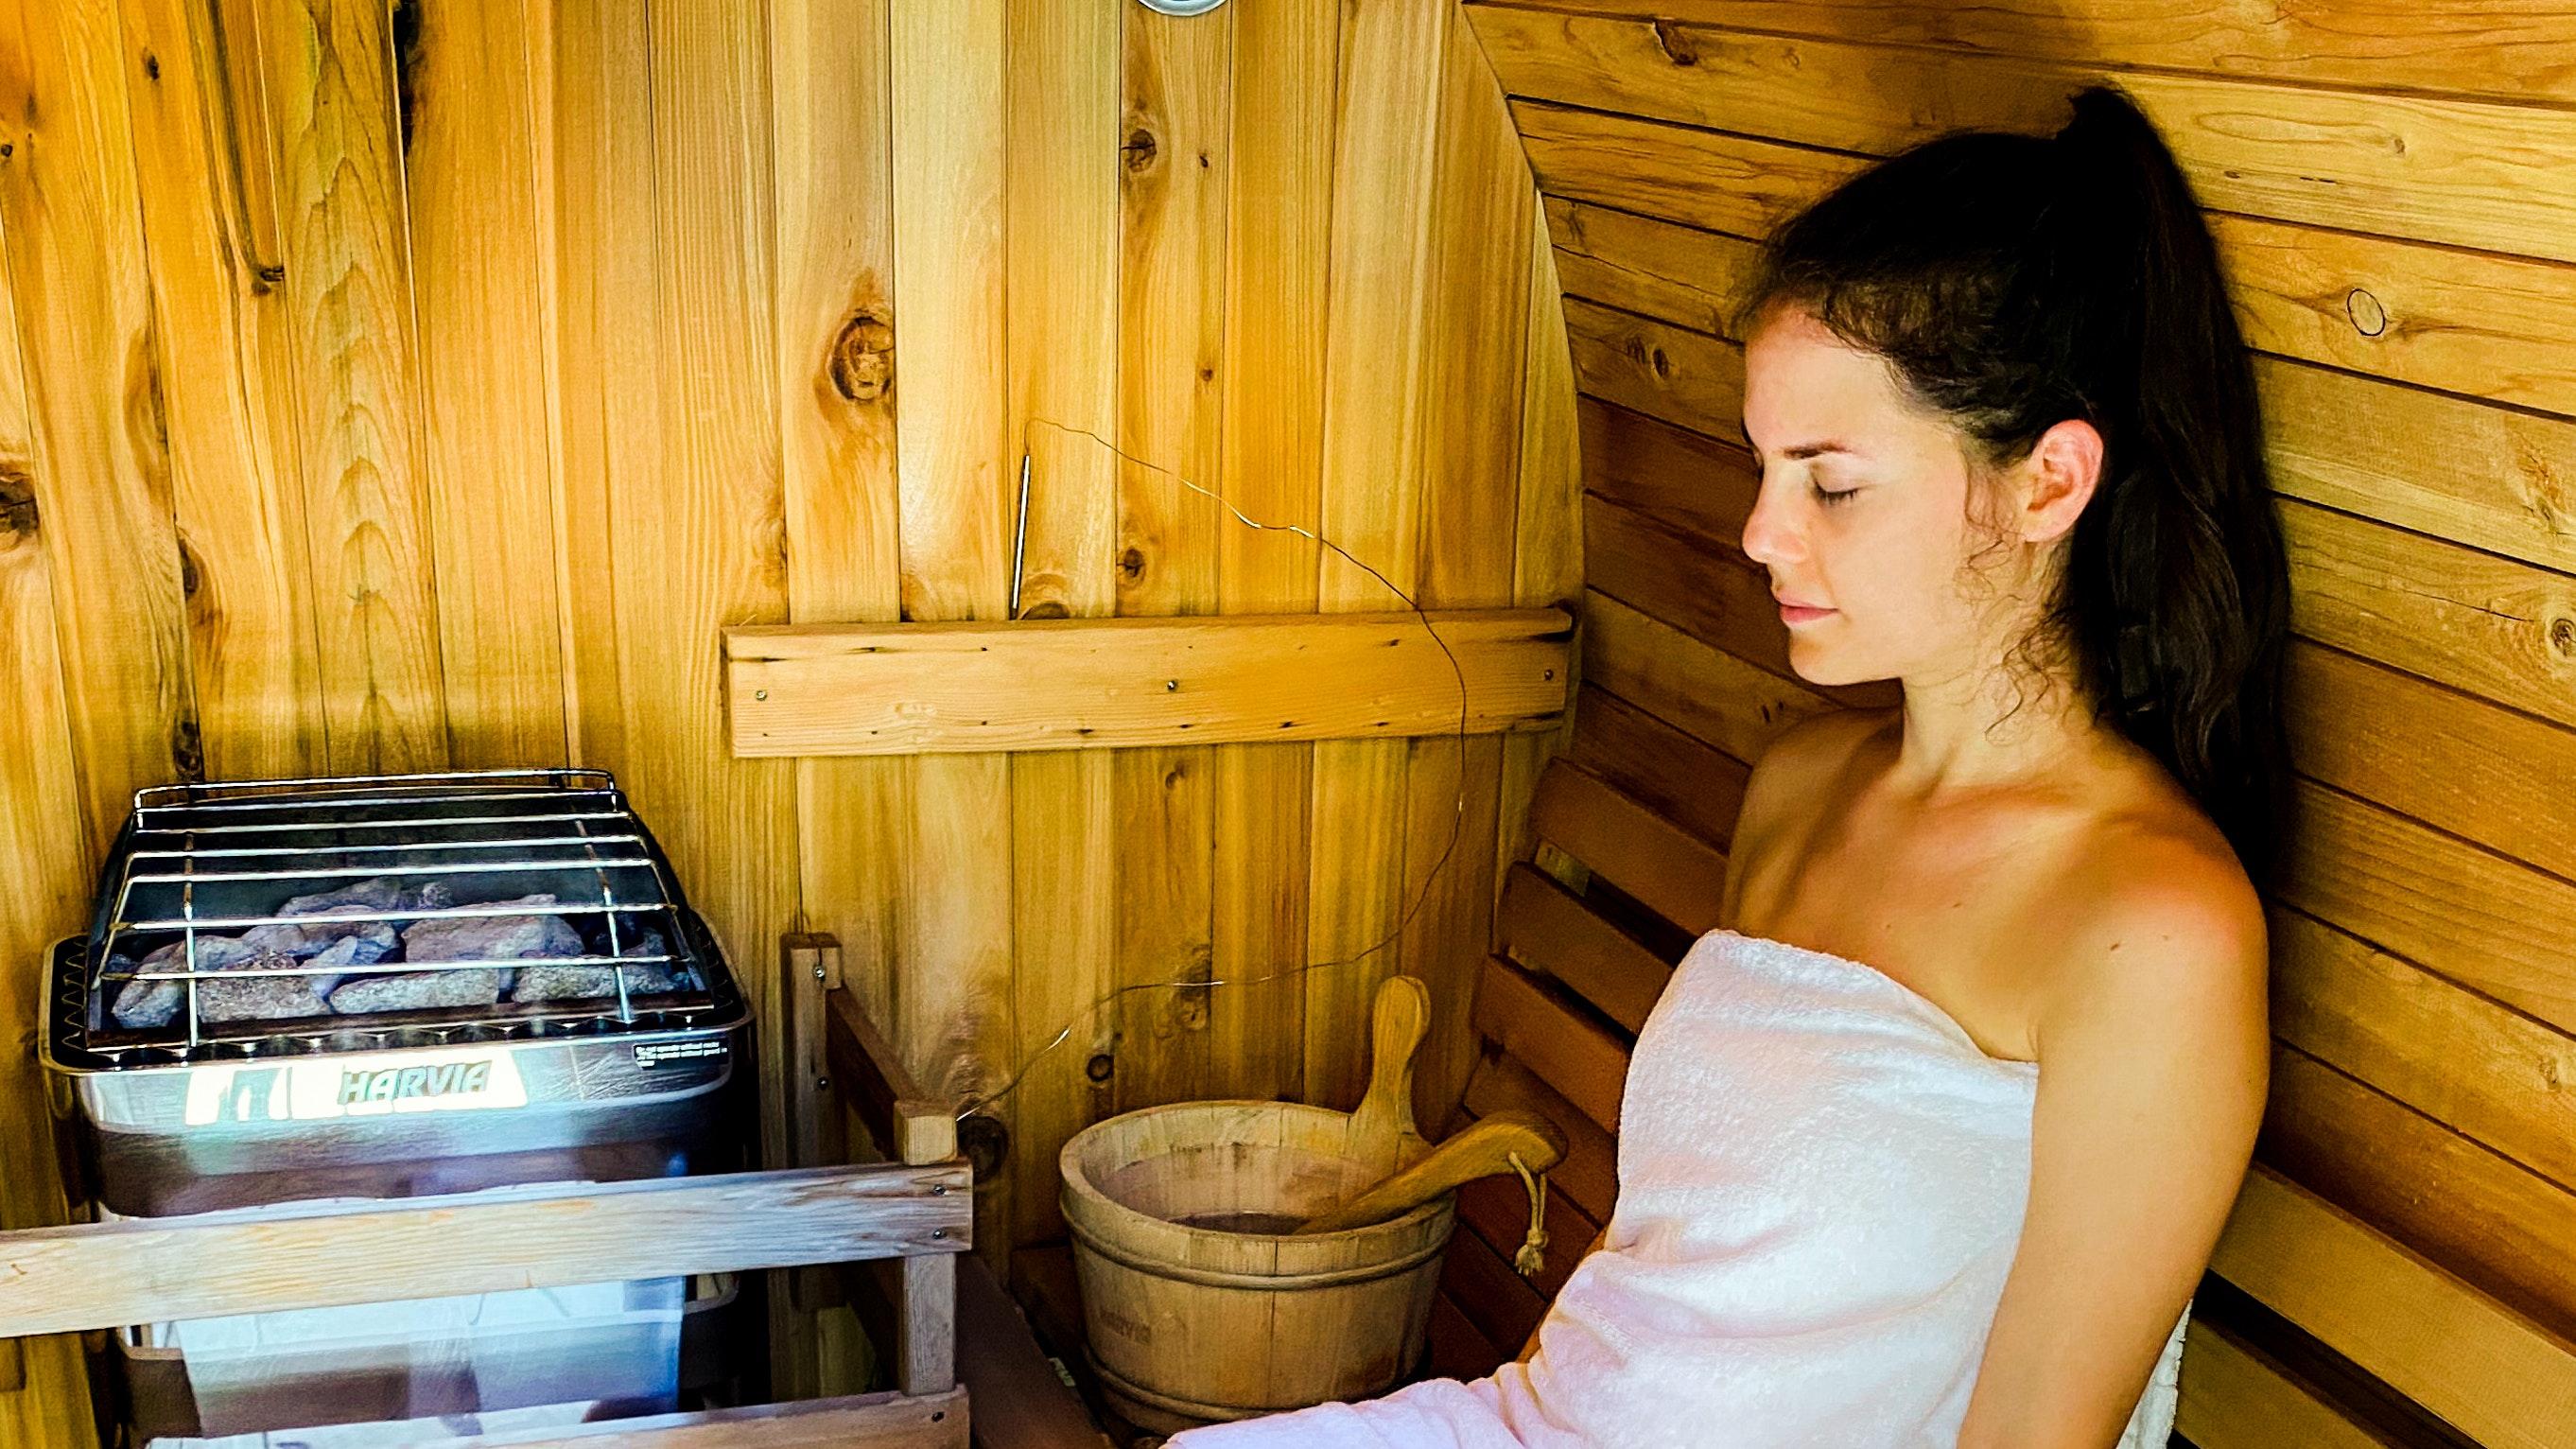 Sitting inside the barrel sauna